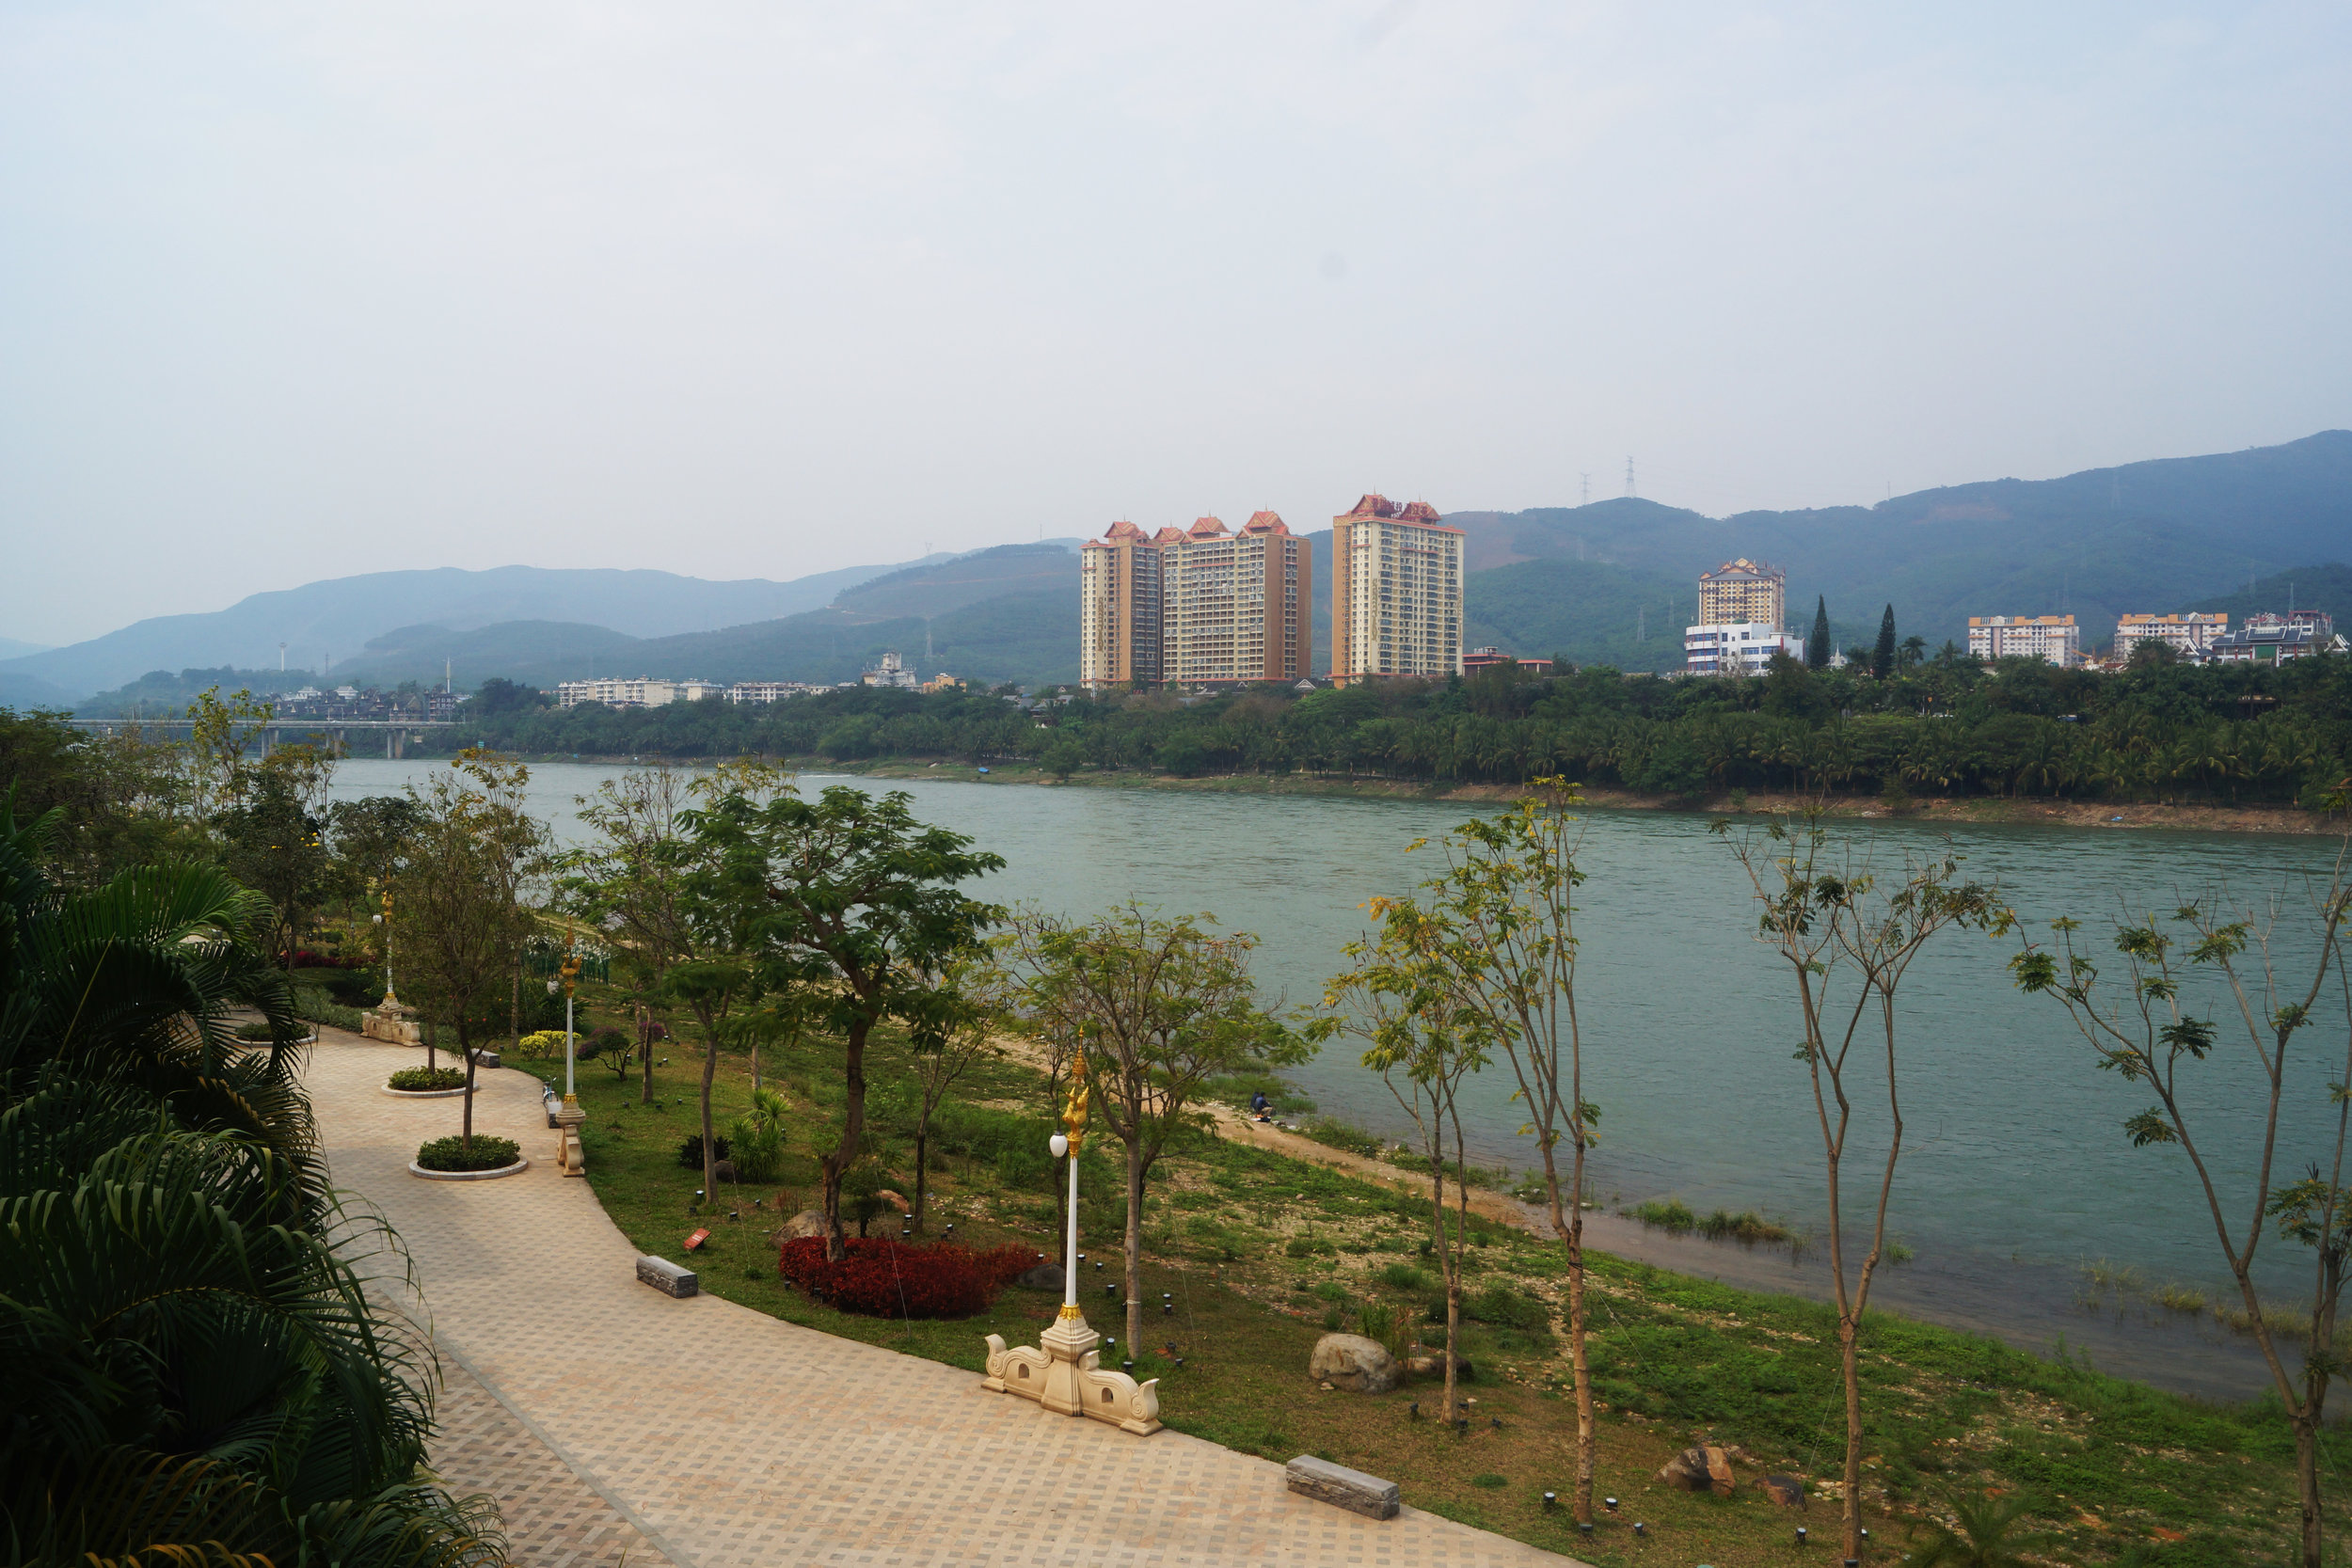 Jinghong, Yunnan, nestled on the banks of the upper Mekong River.